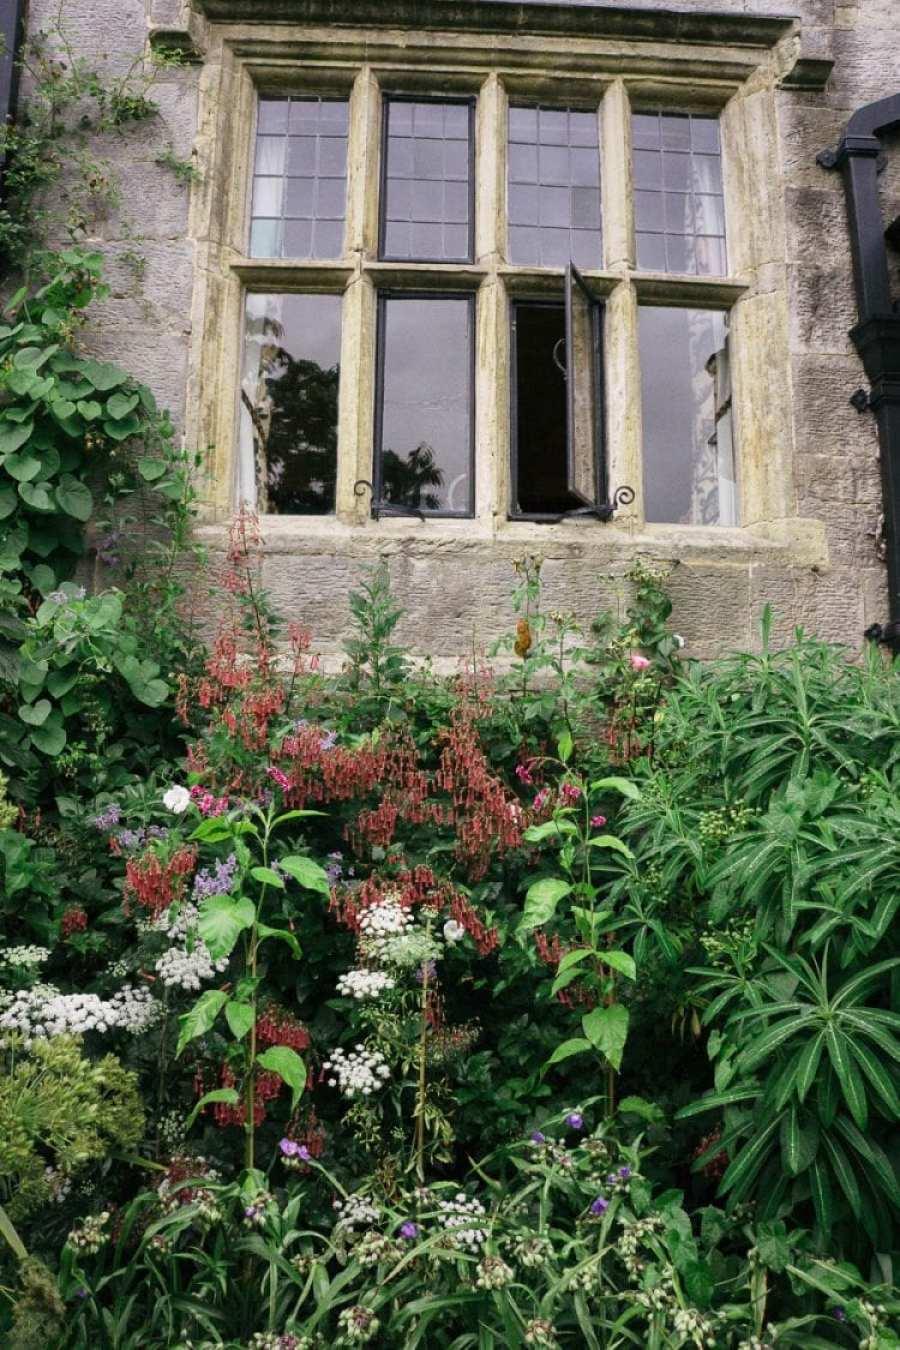 Flower bed below Gravetye window in summer